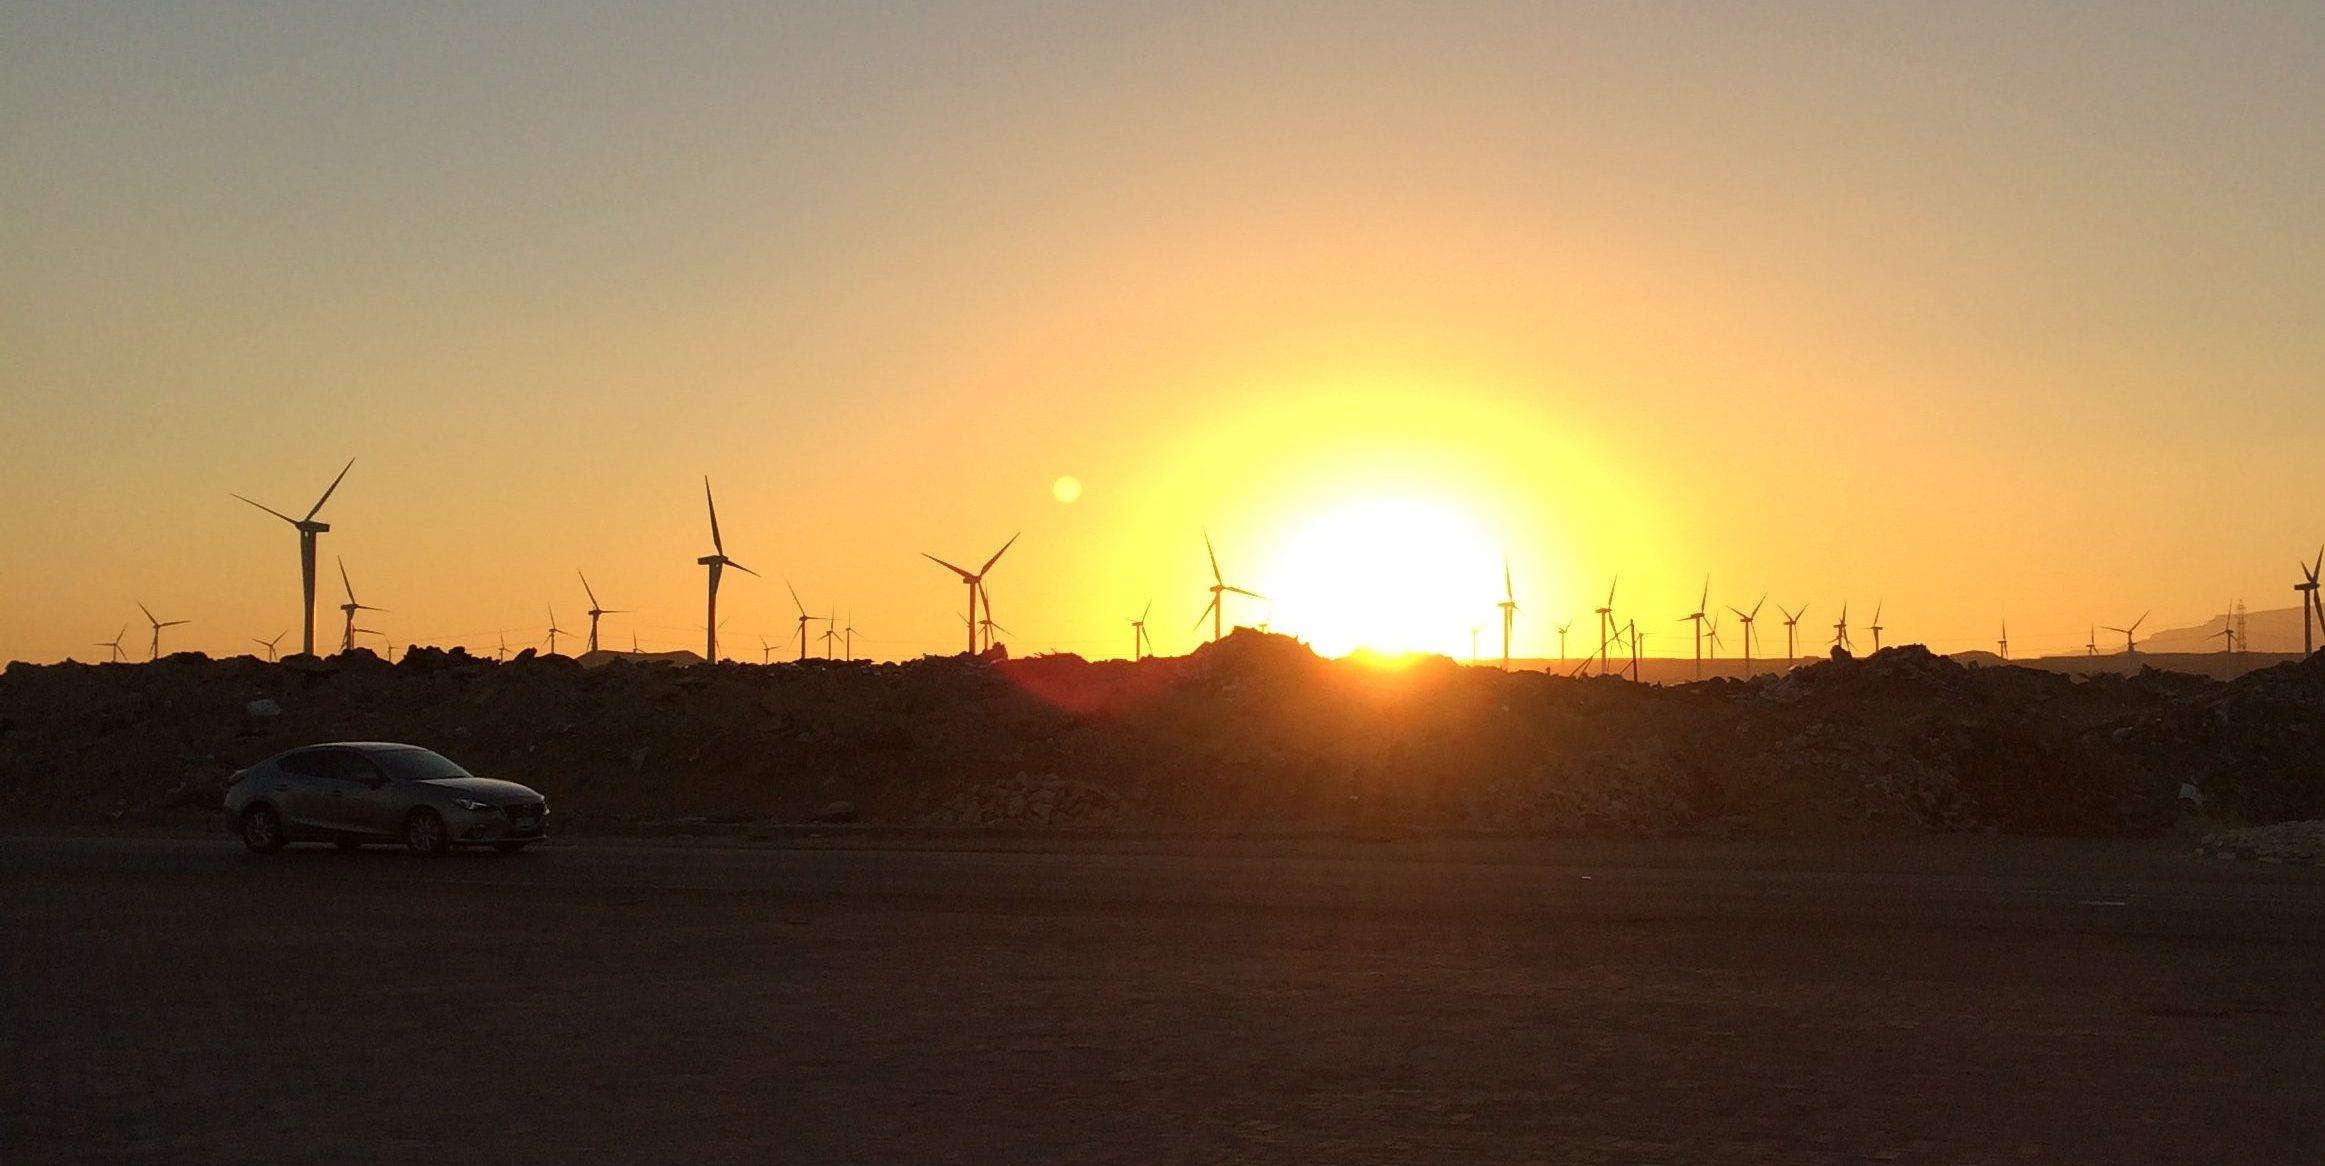 sunset over a wind farm